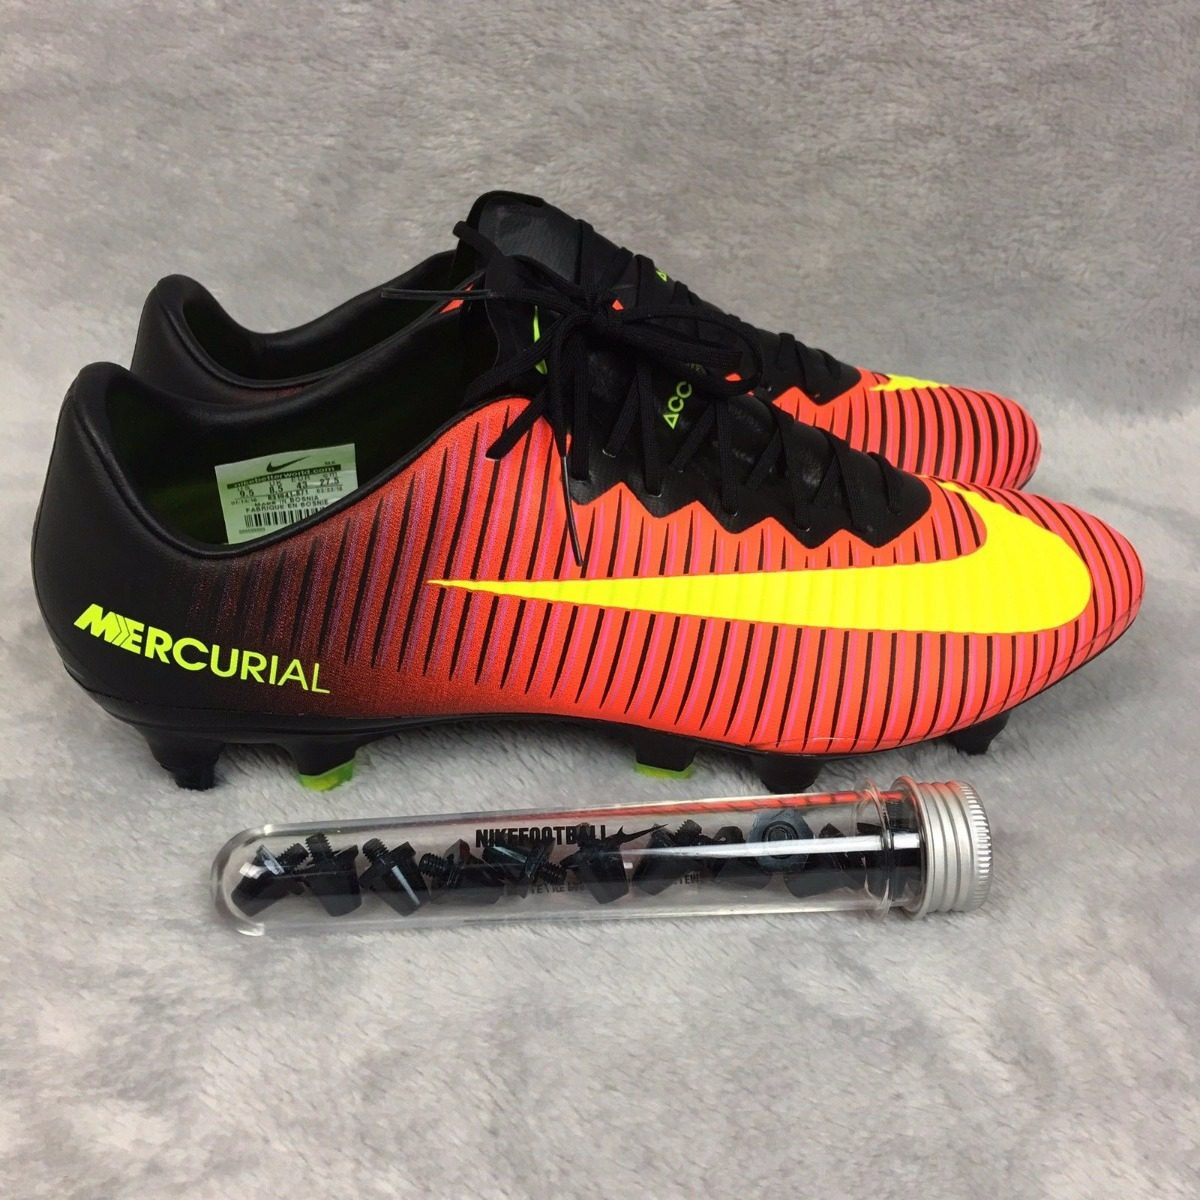 Mercurial Nike Futbol De Wgazqng8 Sg Vapor Pro Ix Zapatos frYqWPvwxr